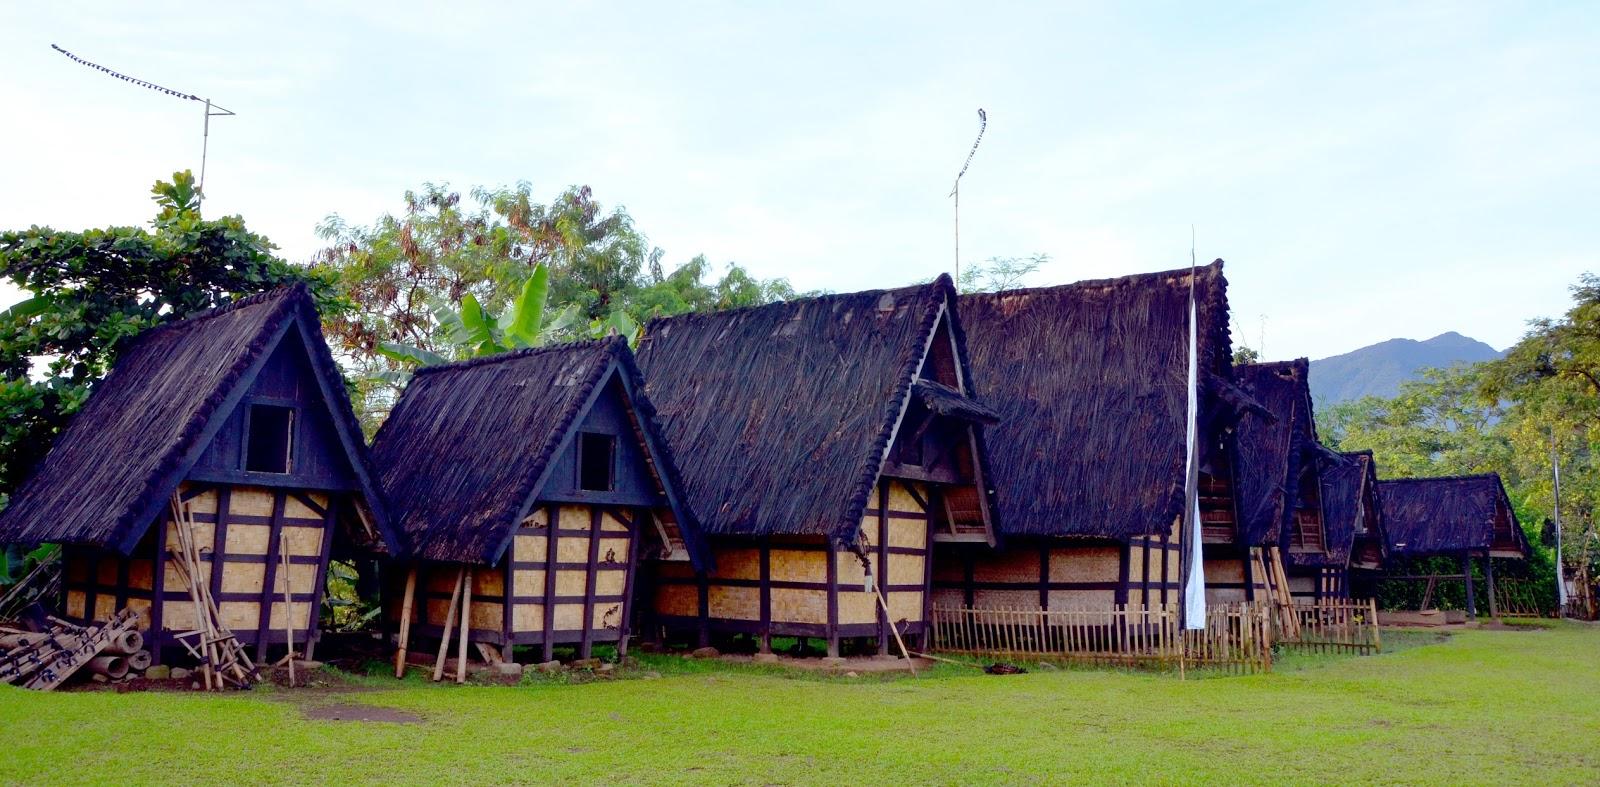 Kampung Budaya Sindang Barang Bogor Cocok Wisata Edukasi Bagi Selama